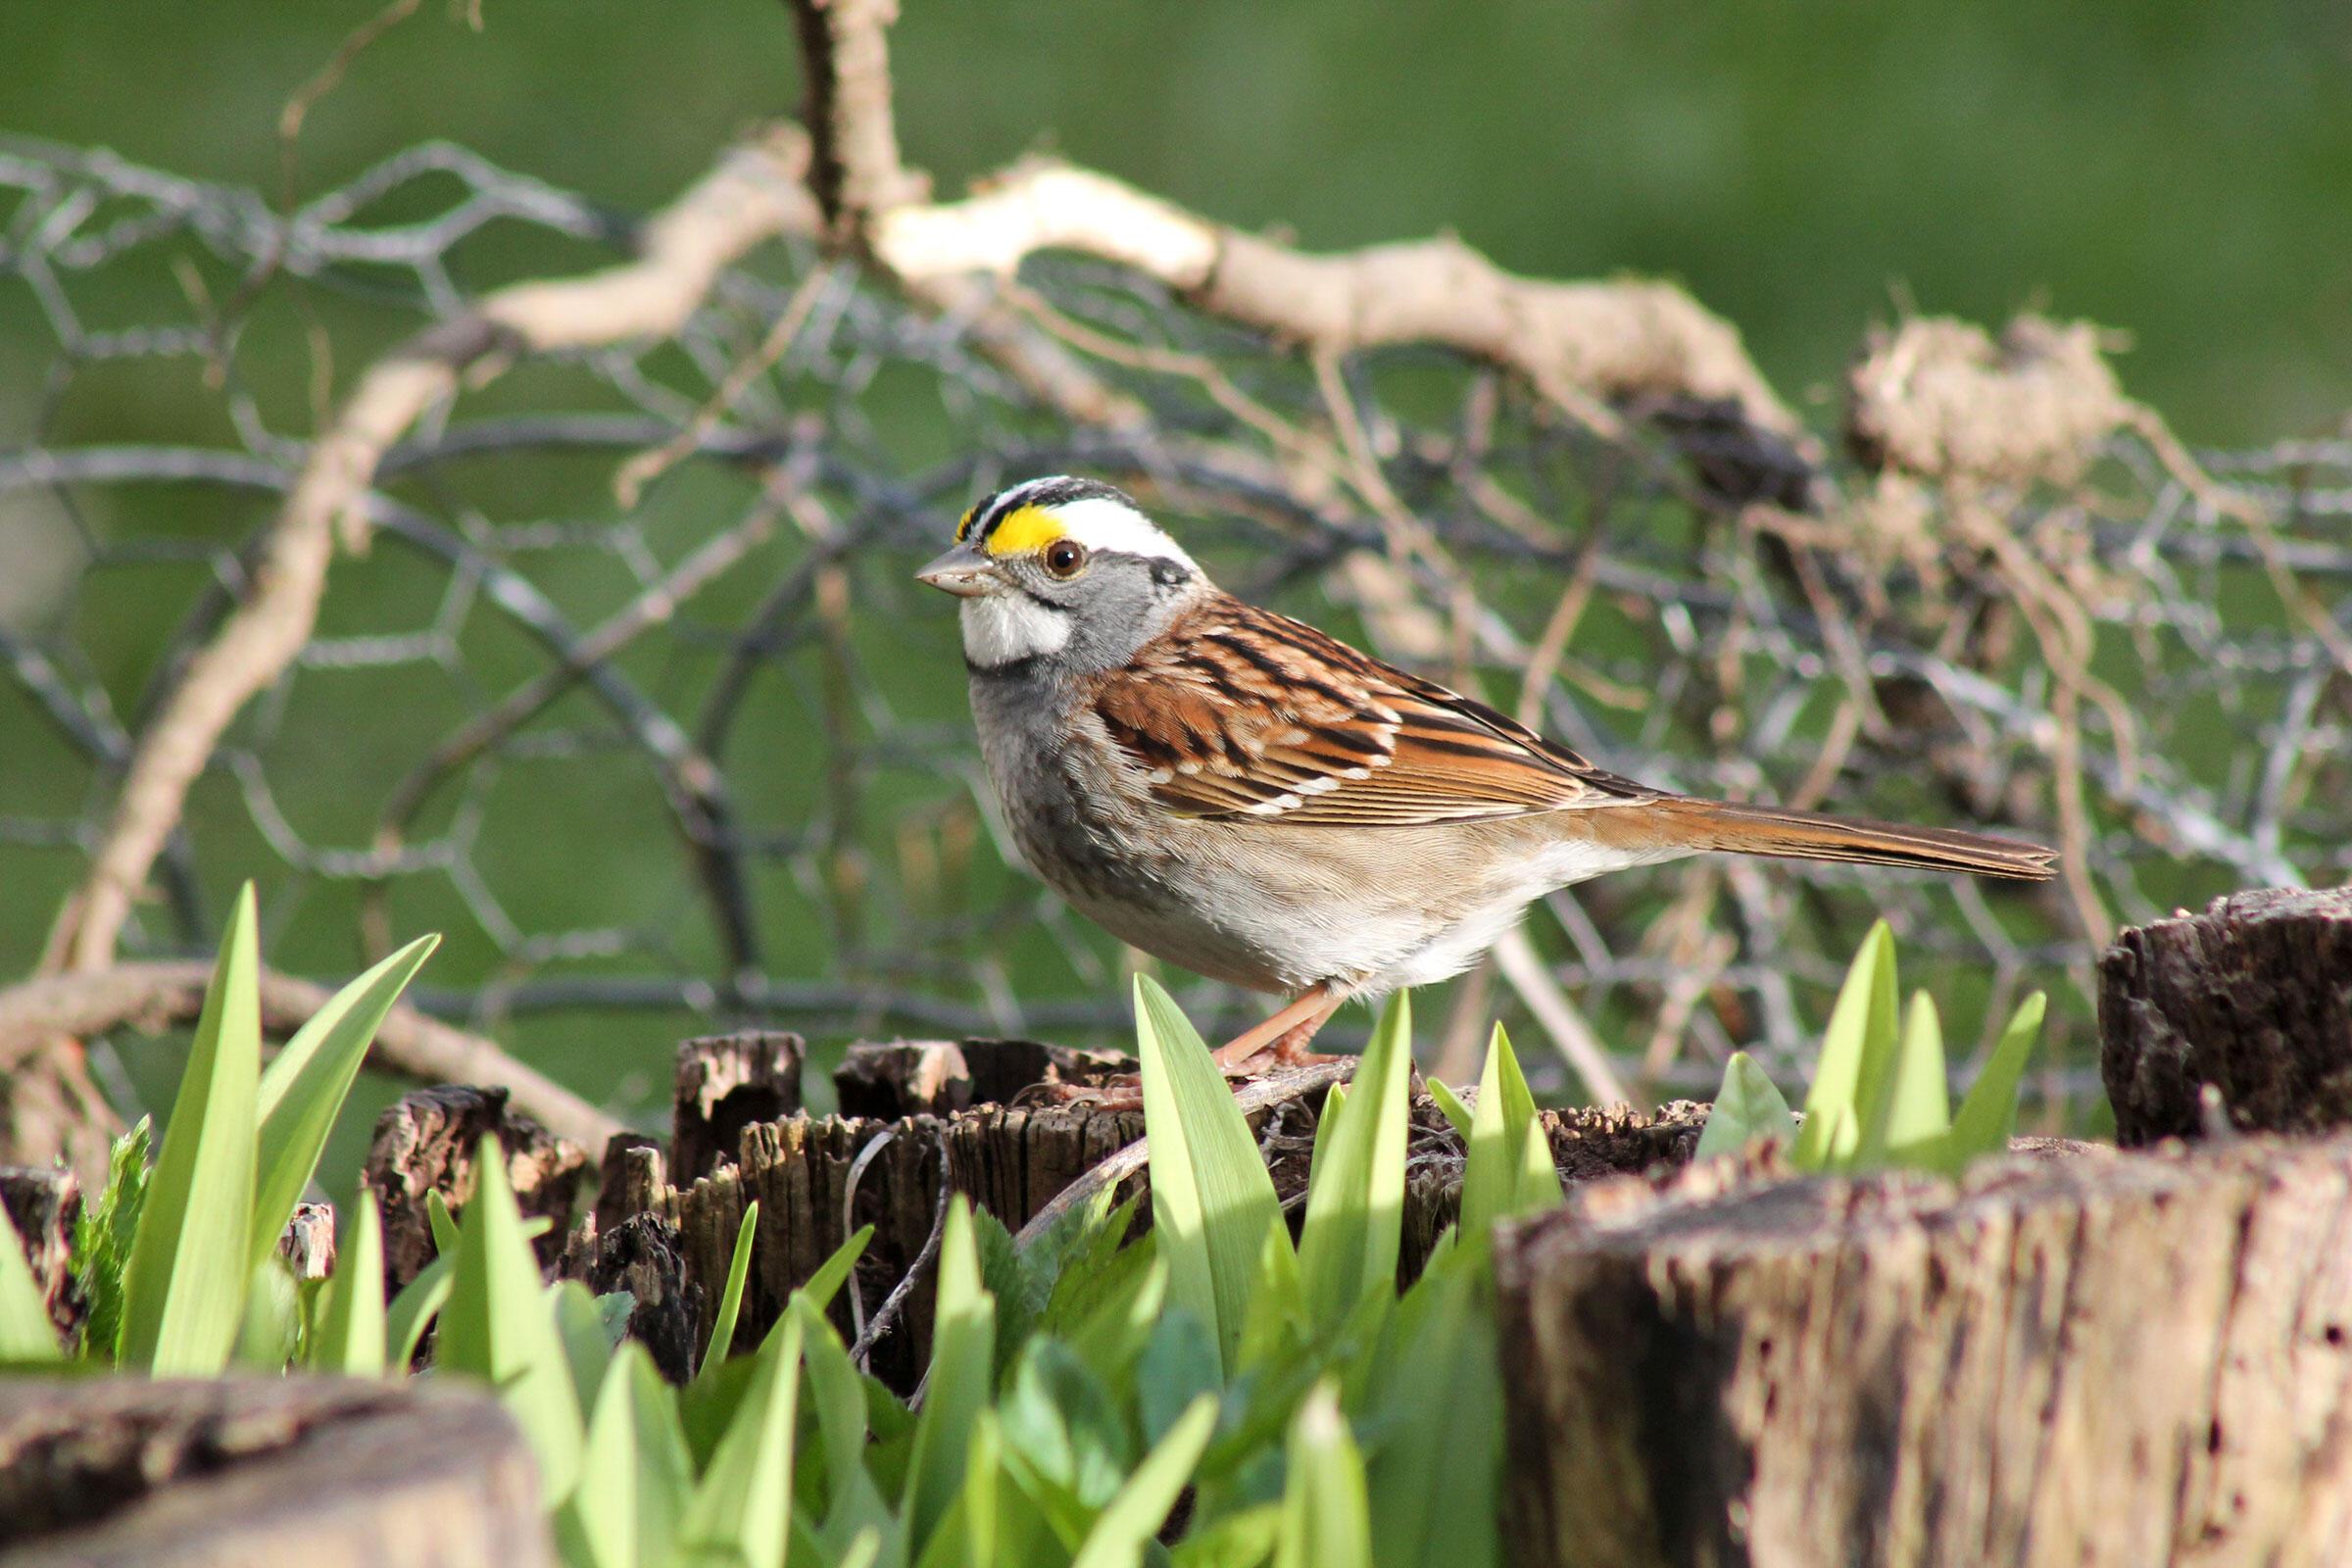 White-throated Sparrow. Aspen Allen/Audubon Photography Awards